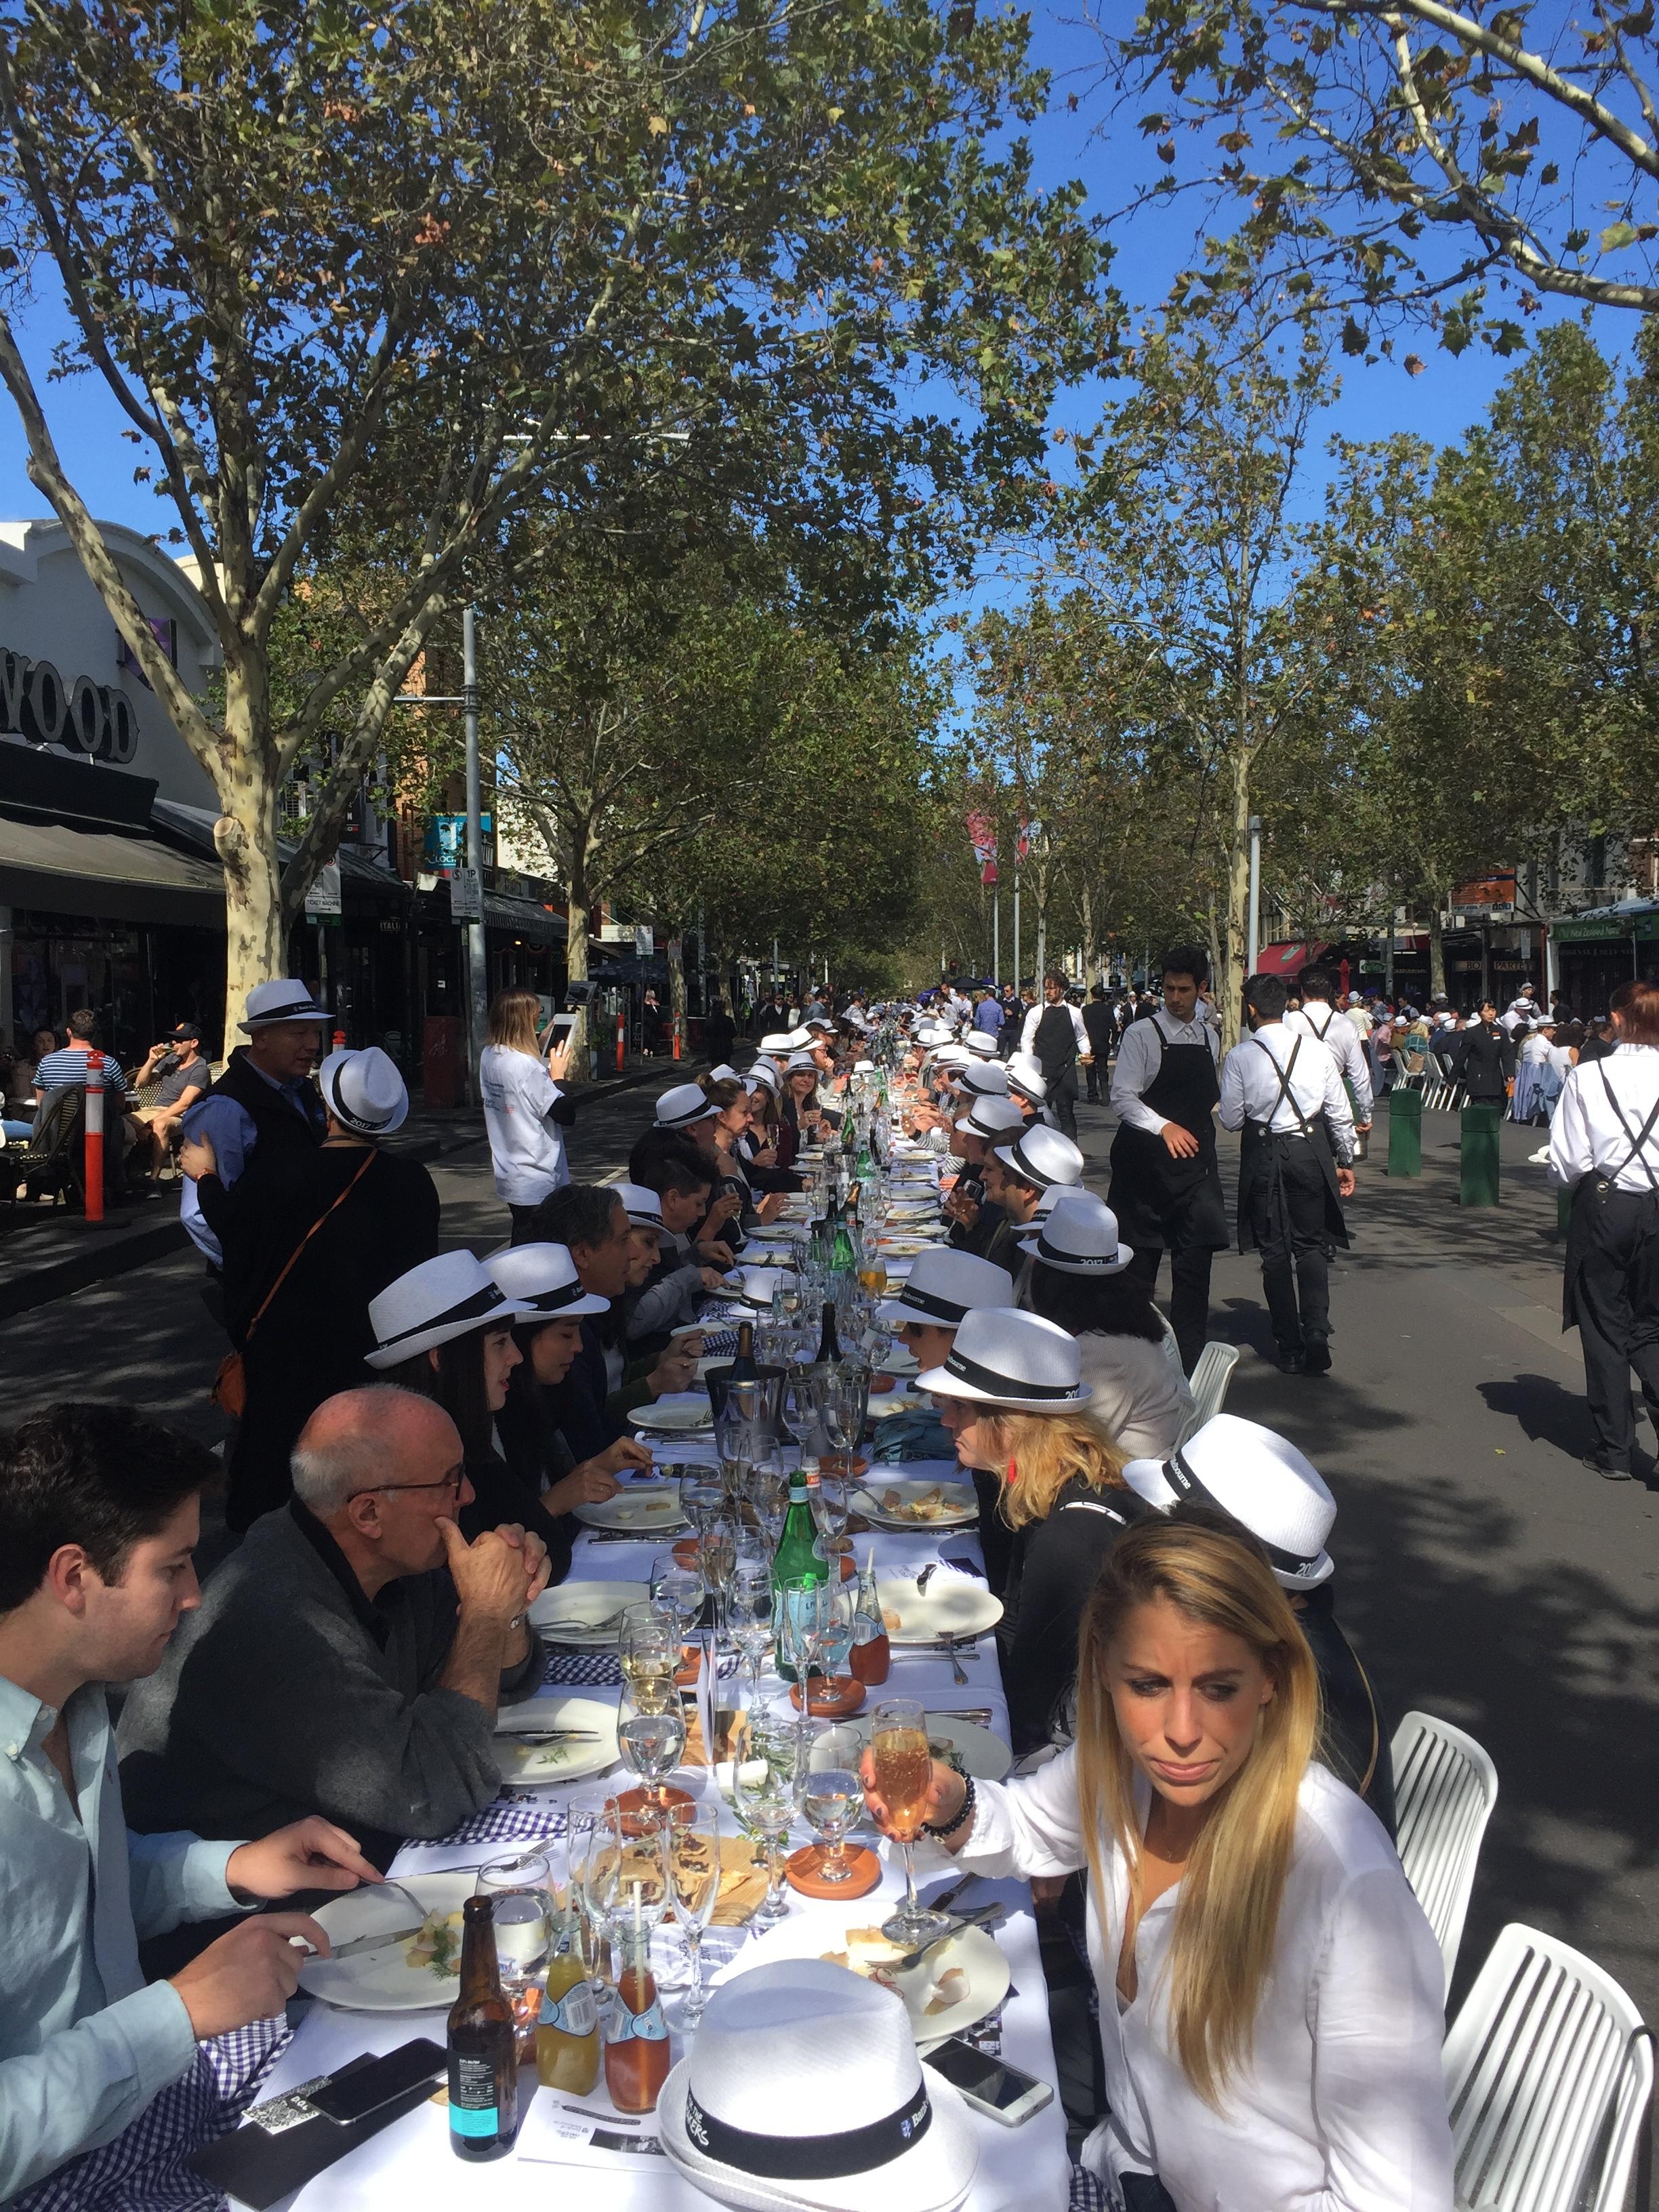 Melbourne Food and Wine Festival's 25th Anniversarymarshals